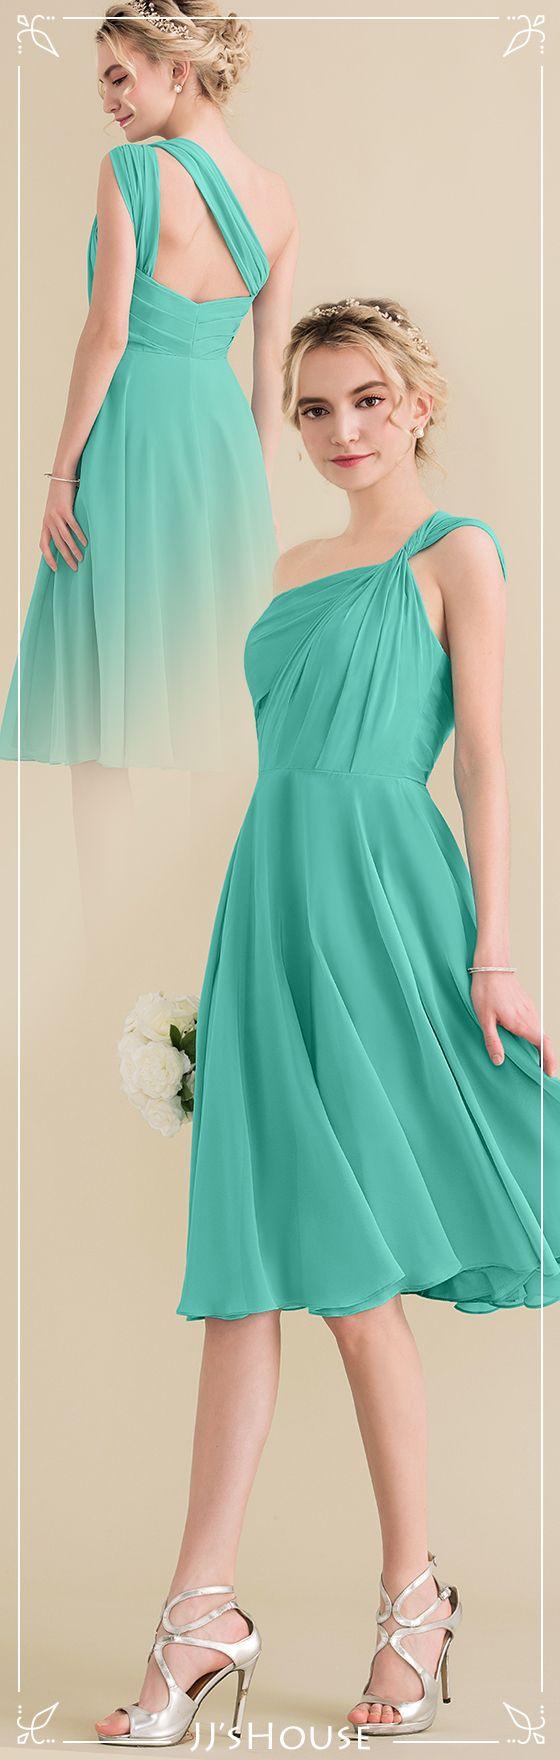 JJsHouse #BridesmaidDresses | Short Prom Dress | Pinterest | Ruffles ...